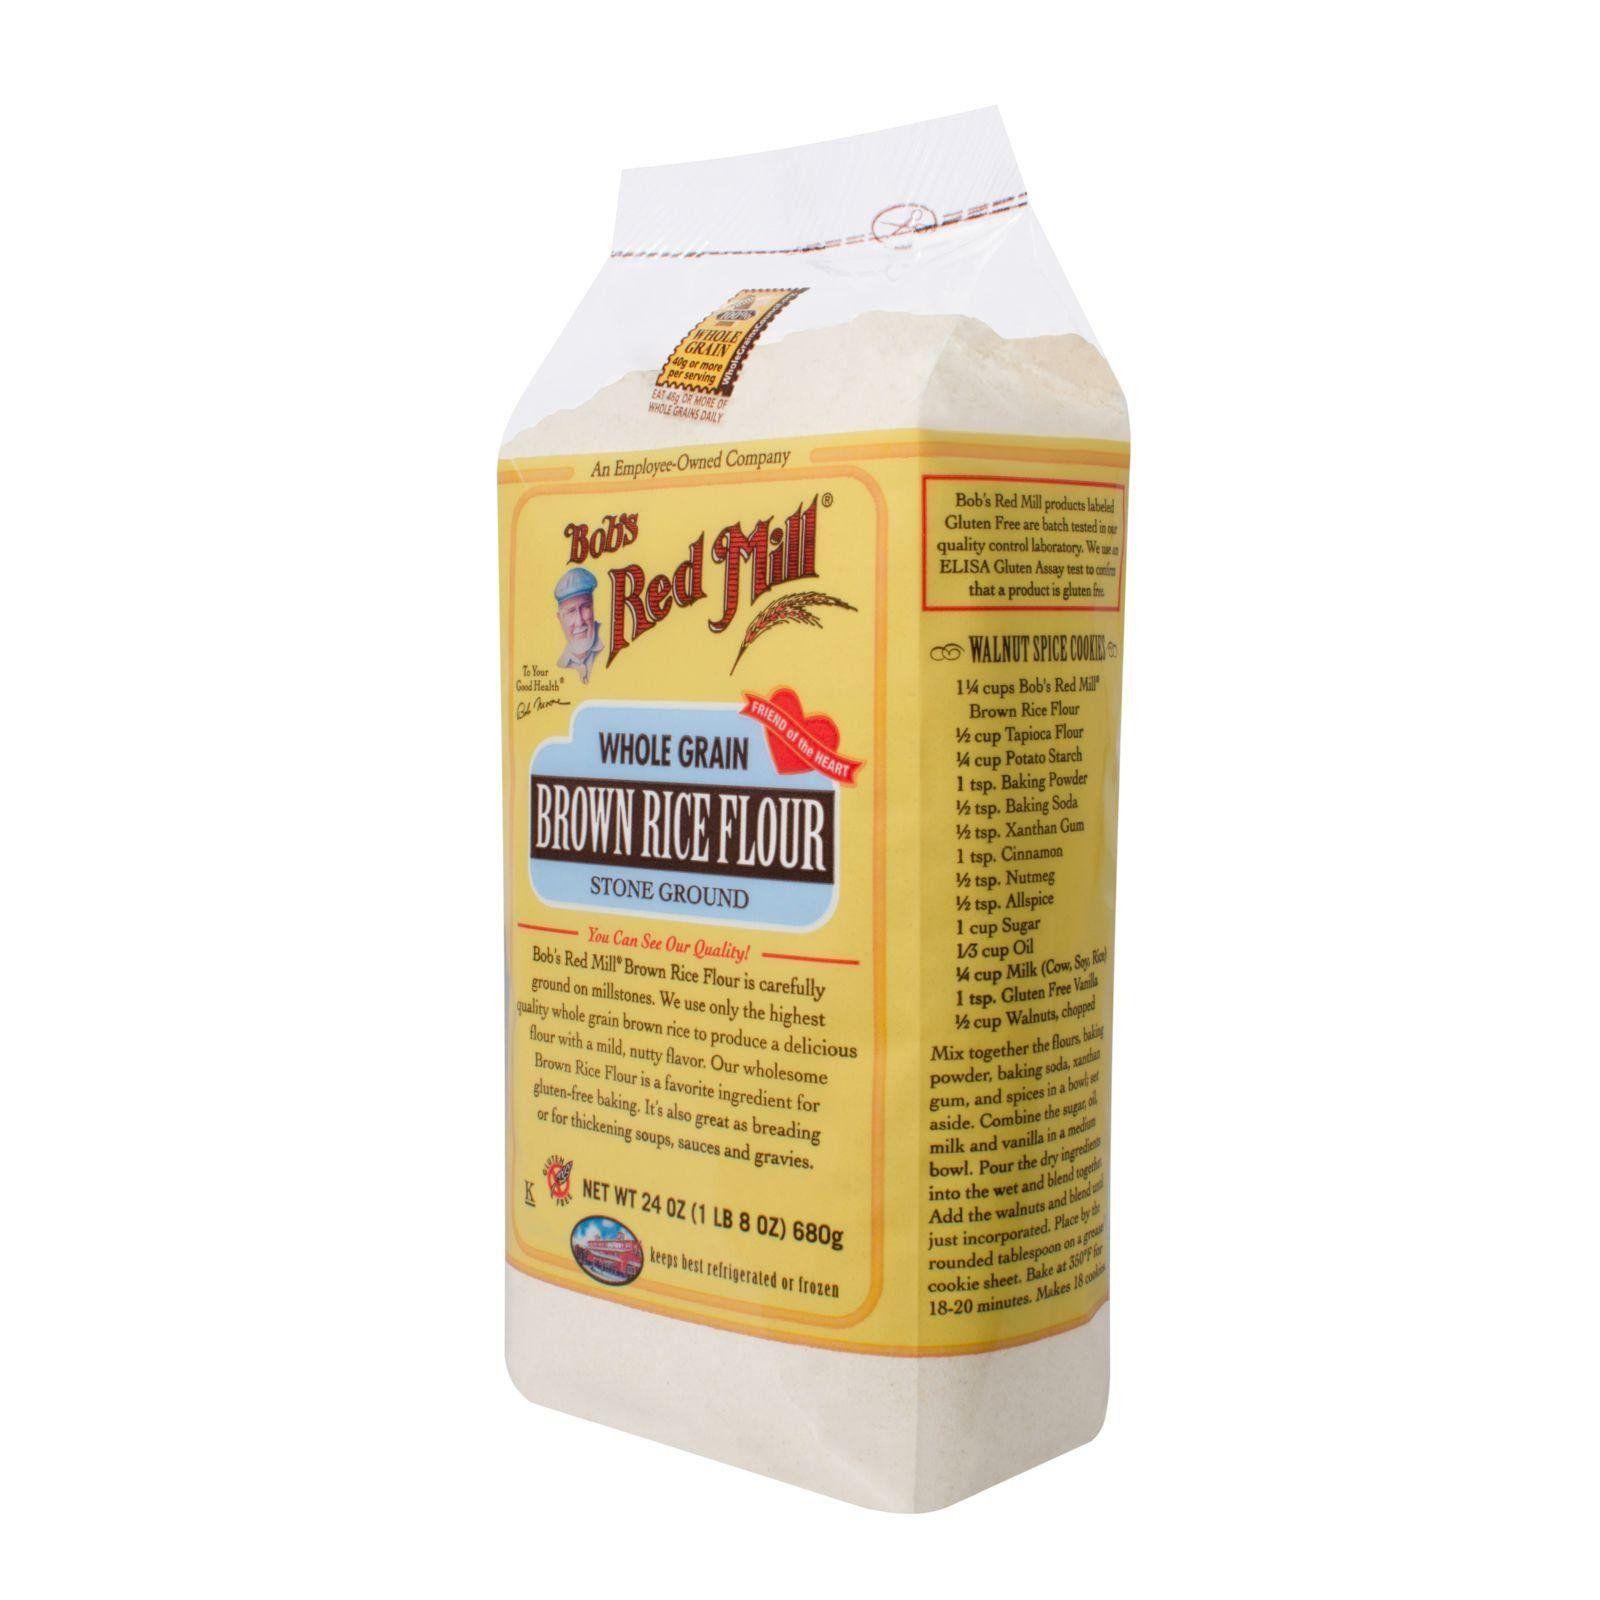 Bob's Red Mill Gluten Free Brown Rice Flour 24 Oz Case